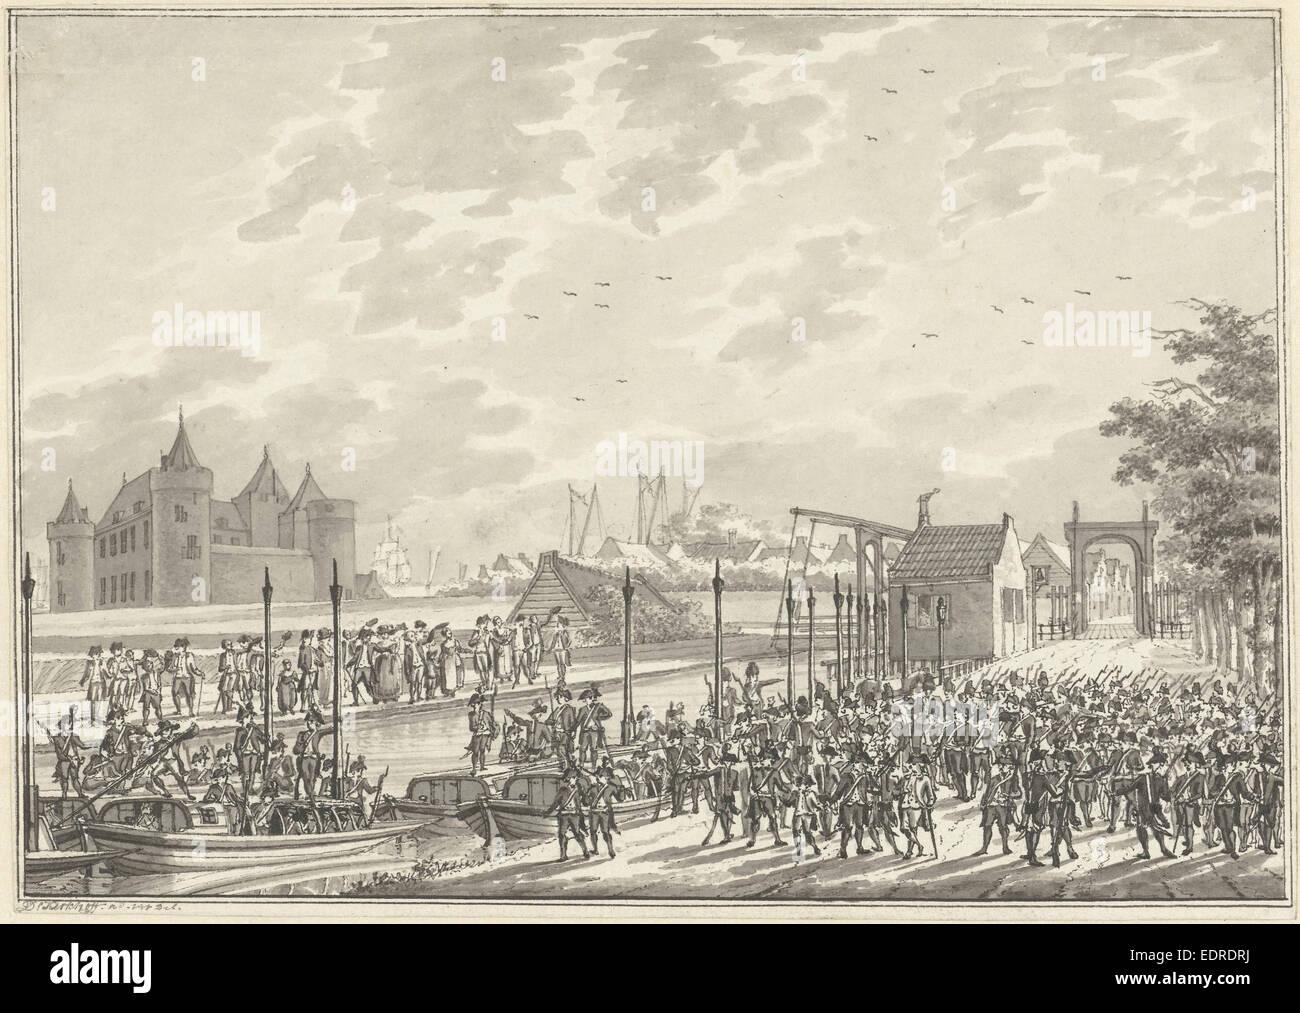 Arrival of Amsterdam armed civilians in Muiden The Netherlands, 1787, Daniël Kerkhoff - Stock Image